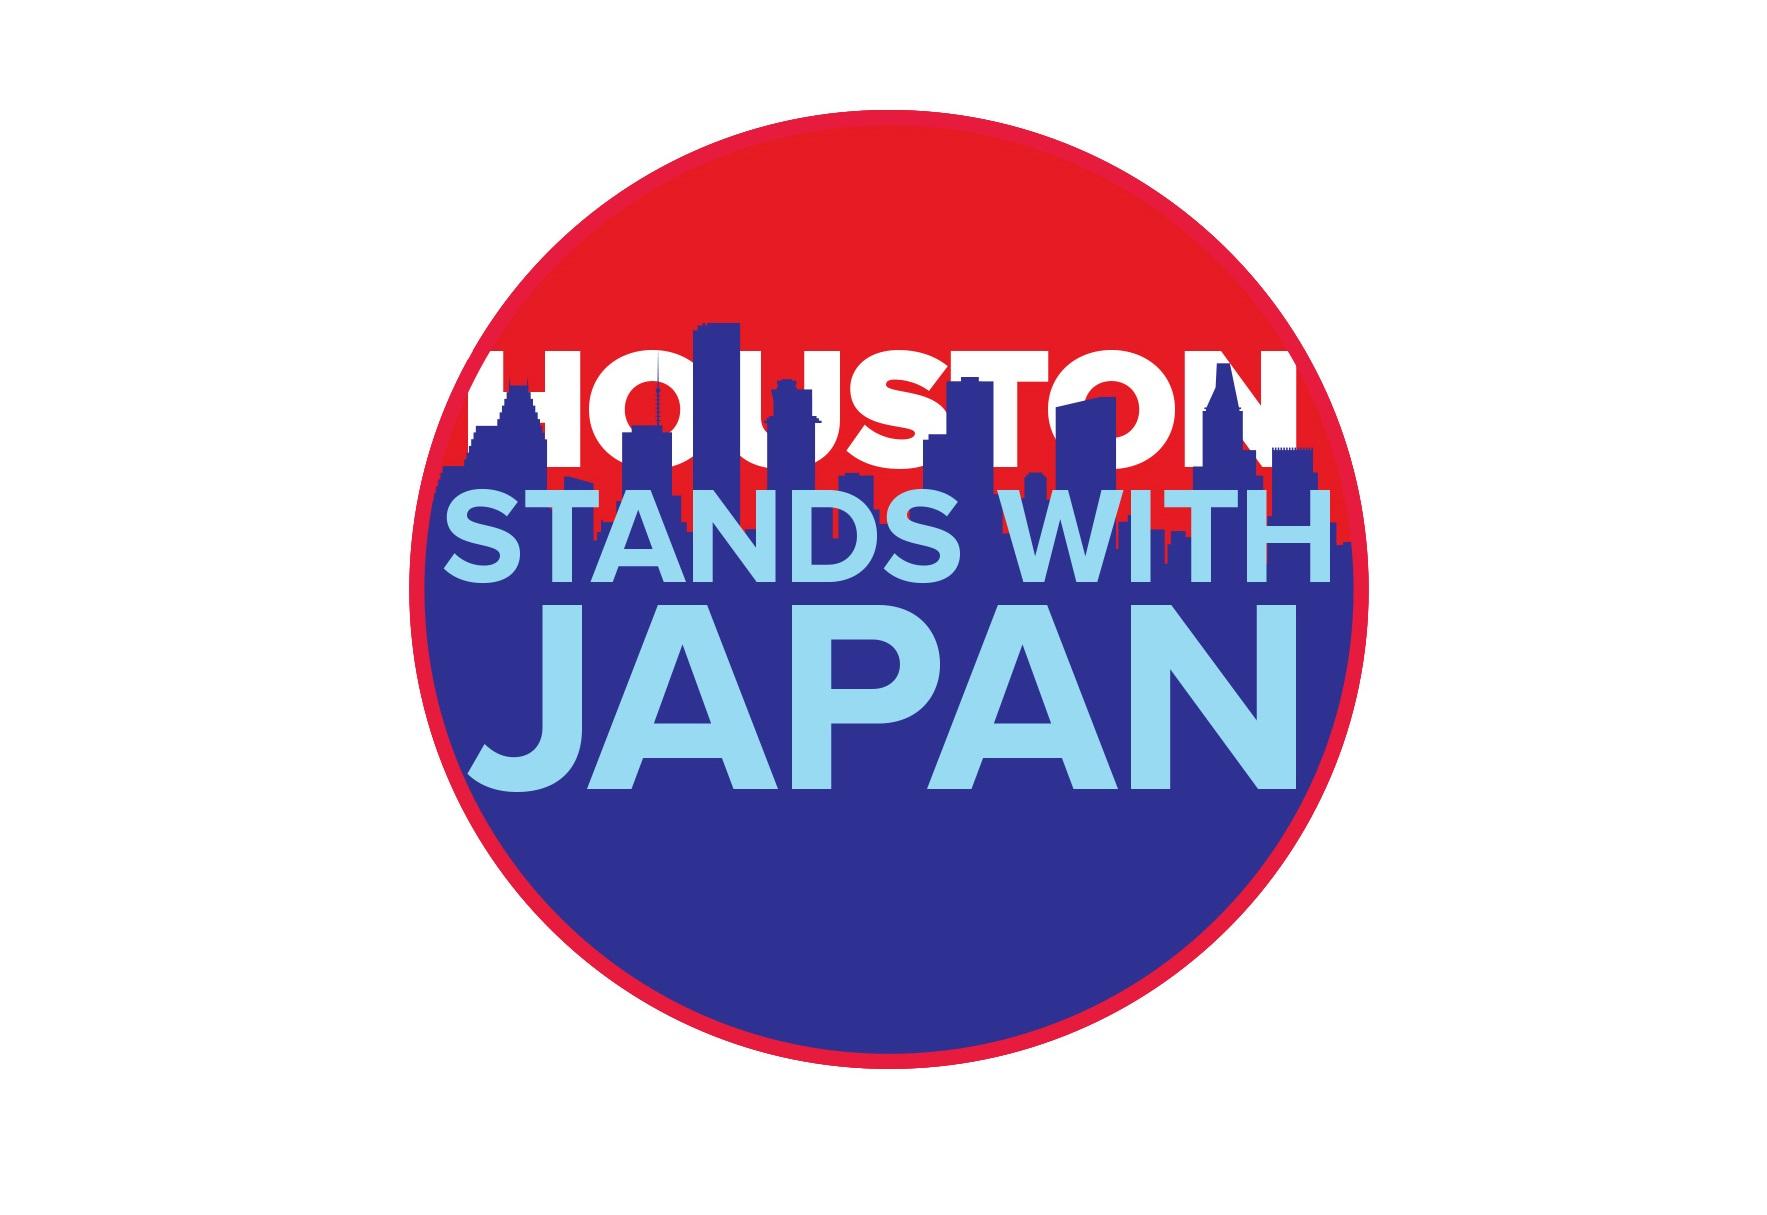 HStandsWithJapan_Top-Slide-Master_july_2018_white_resized.jpg